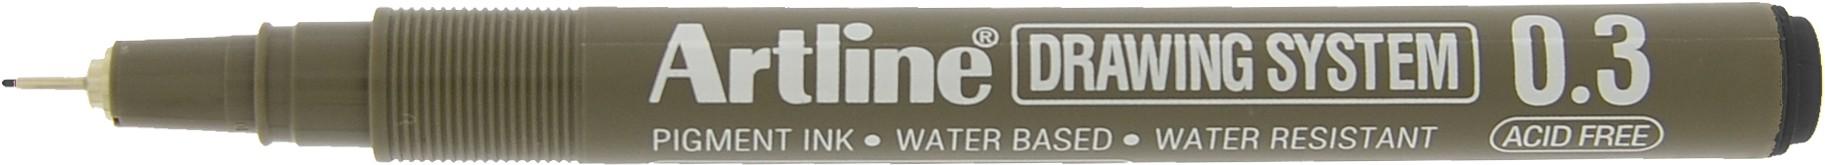 Marker pentru desen tehnic ARTLINE, varf fetru 0.3mm - negru